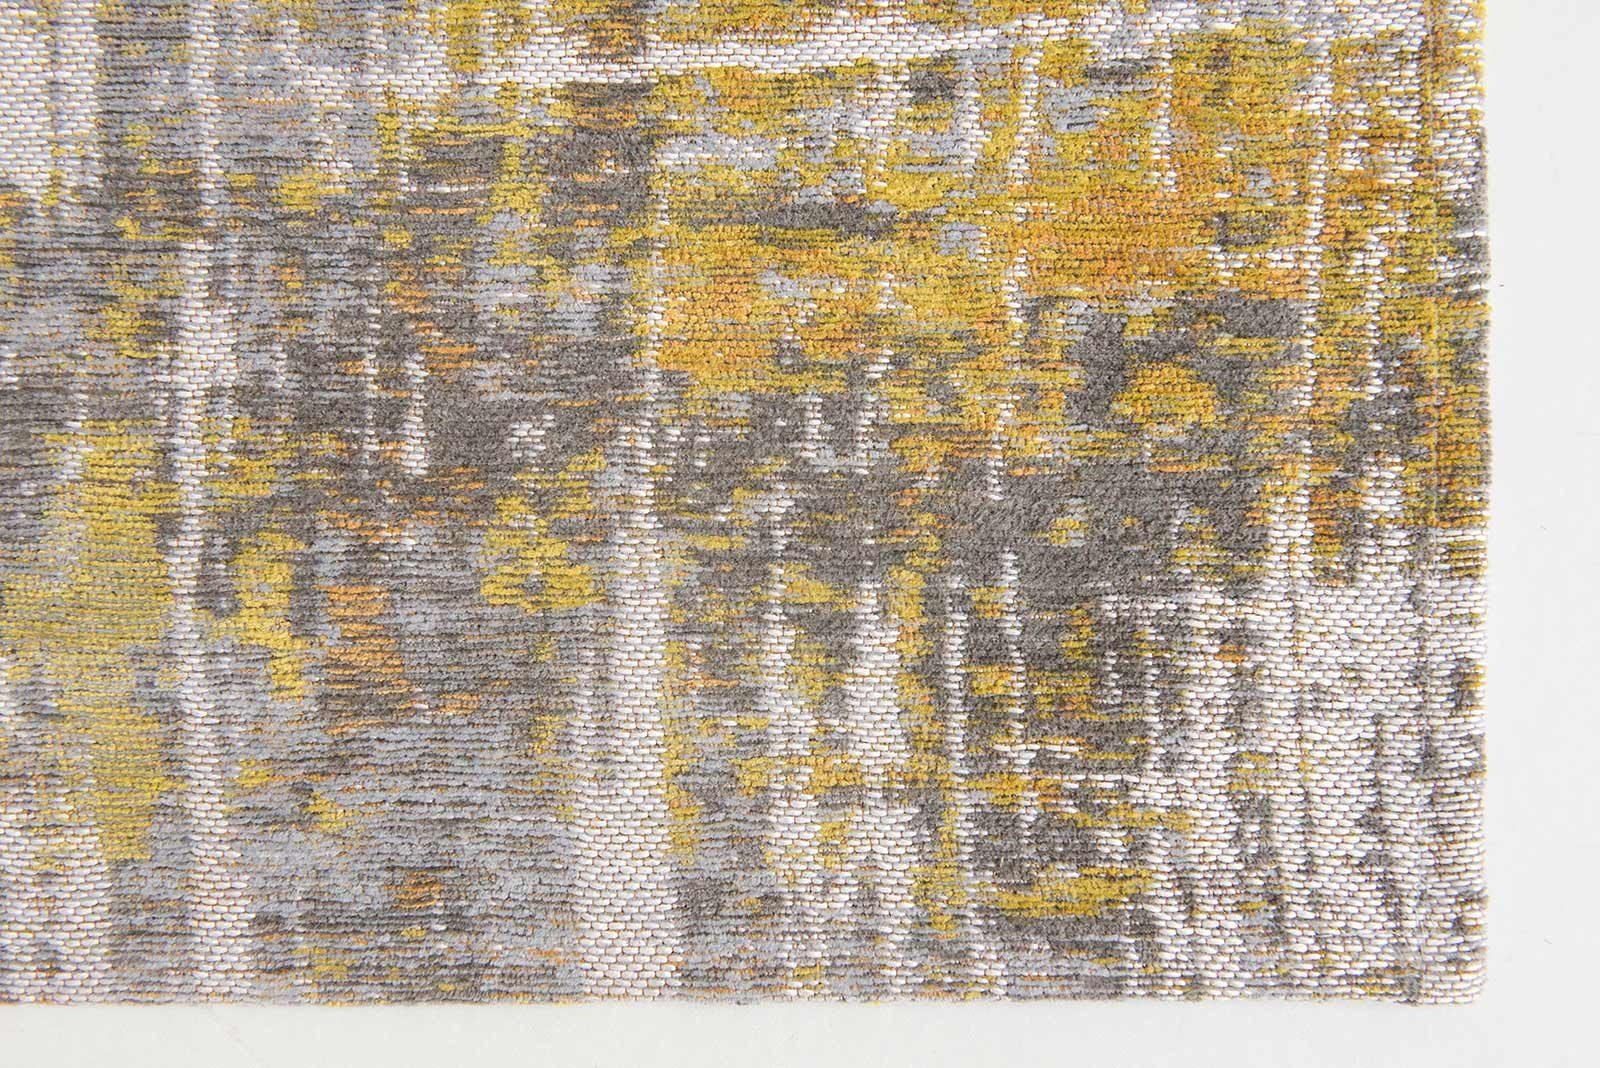 alfombras Louis De Poortere LX8715 Atlantic Streaks Sea Bright Sunny corner